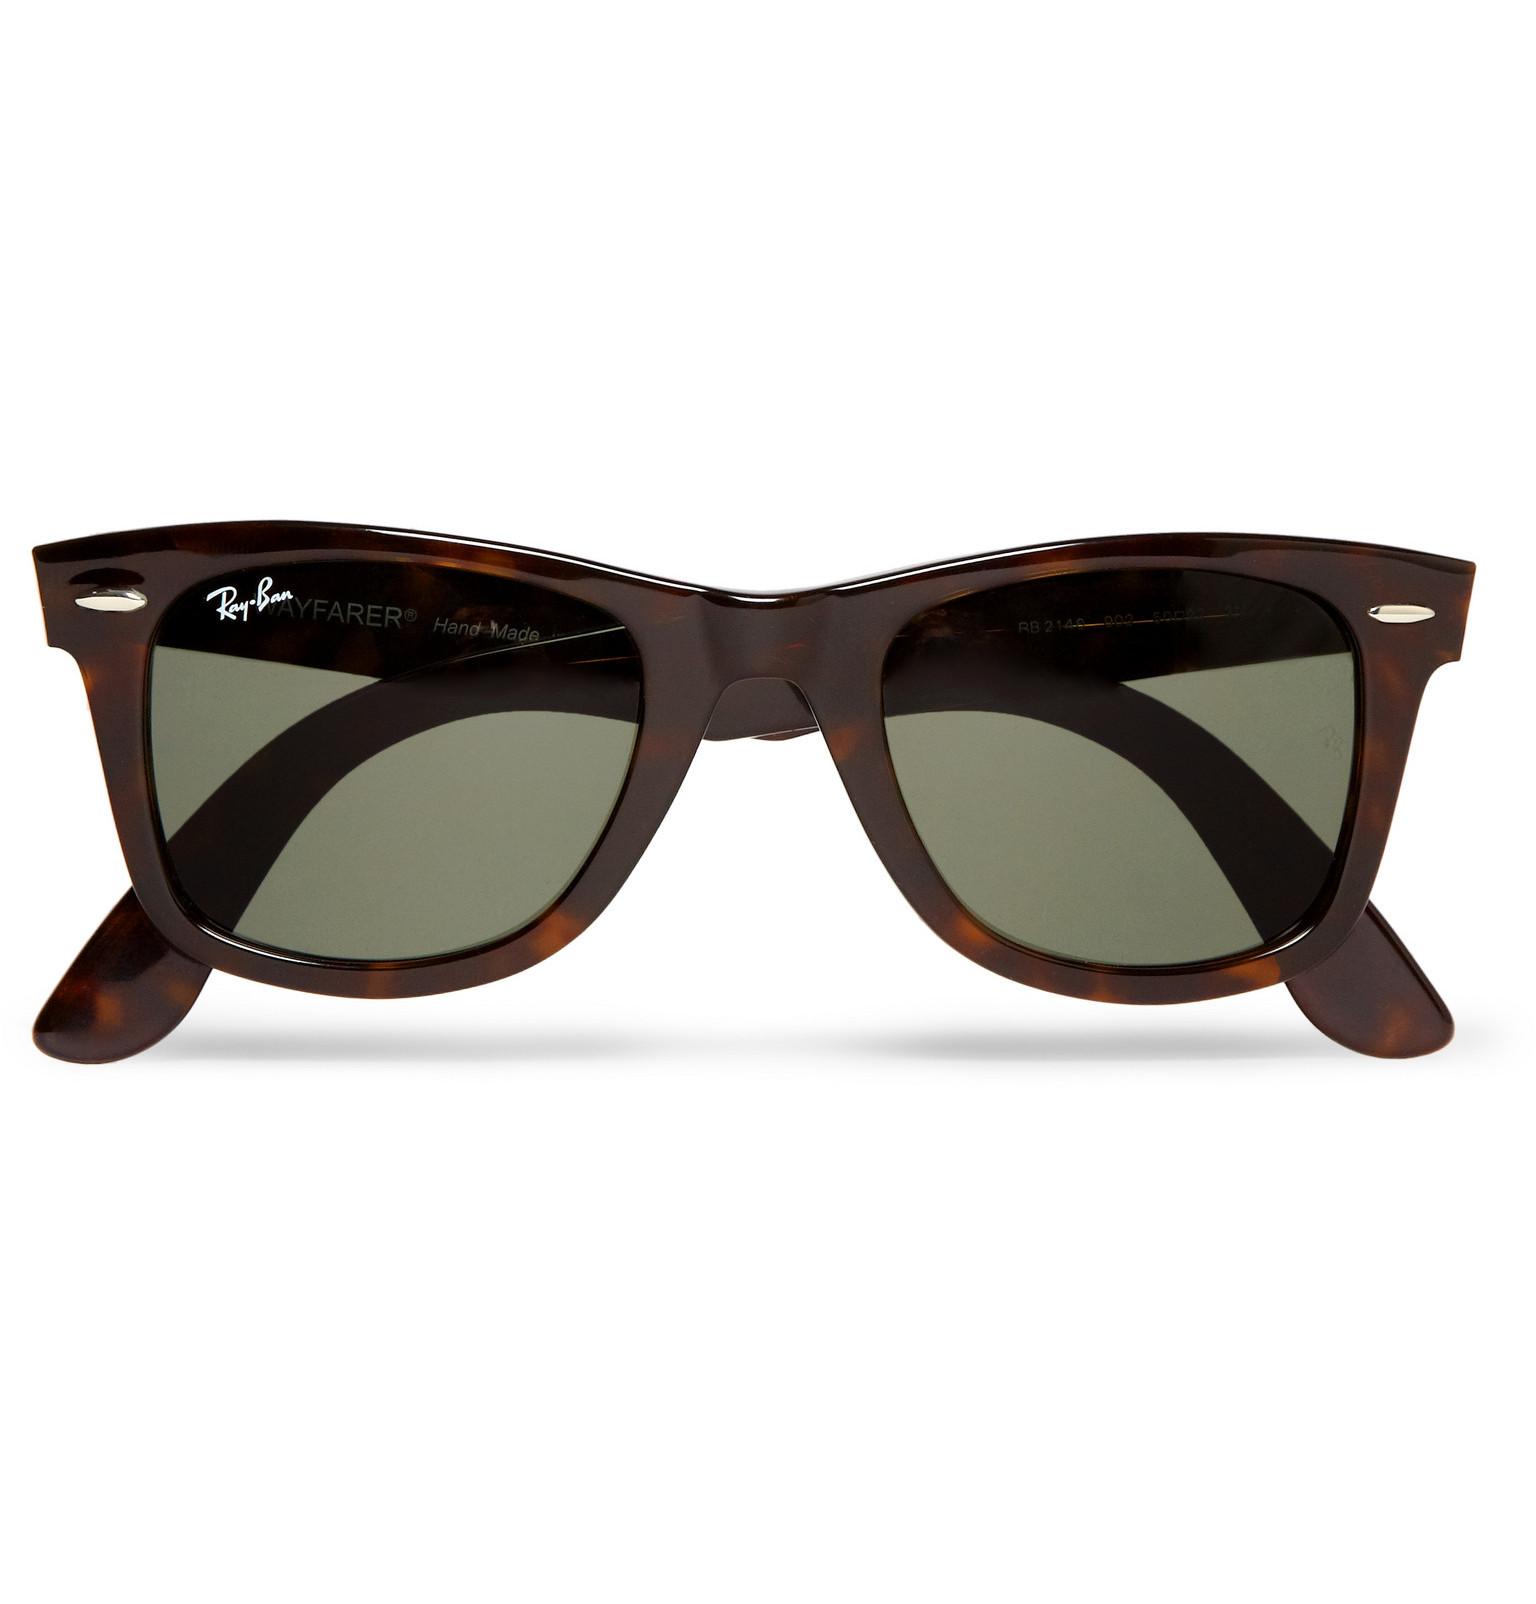 b7b6b1acee1 Ray-Ban - Original Wayfarer Acetate Sunglasses